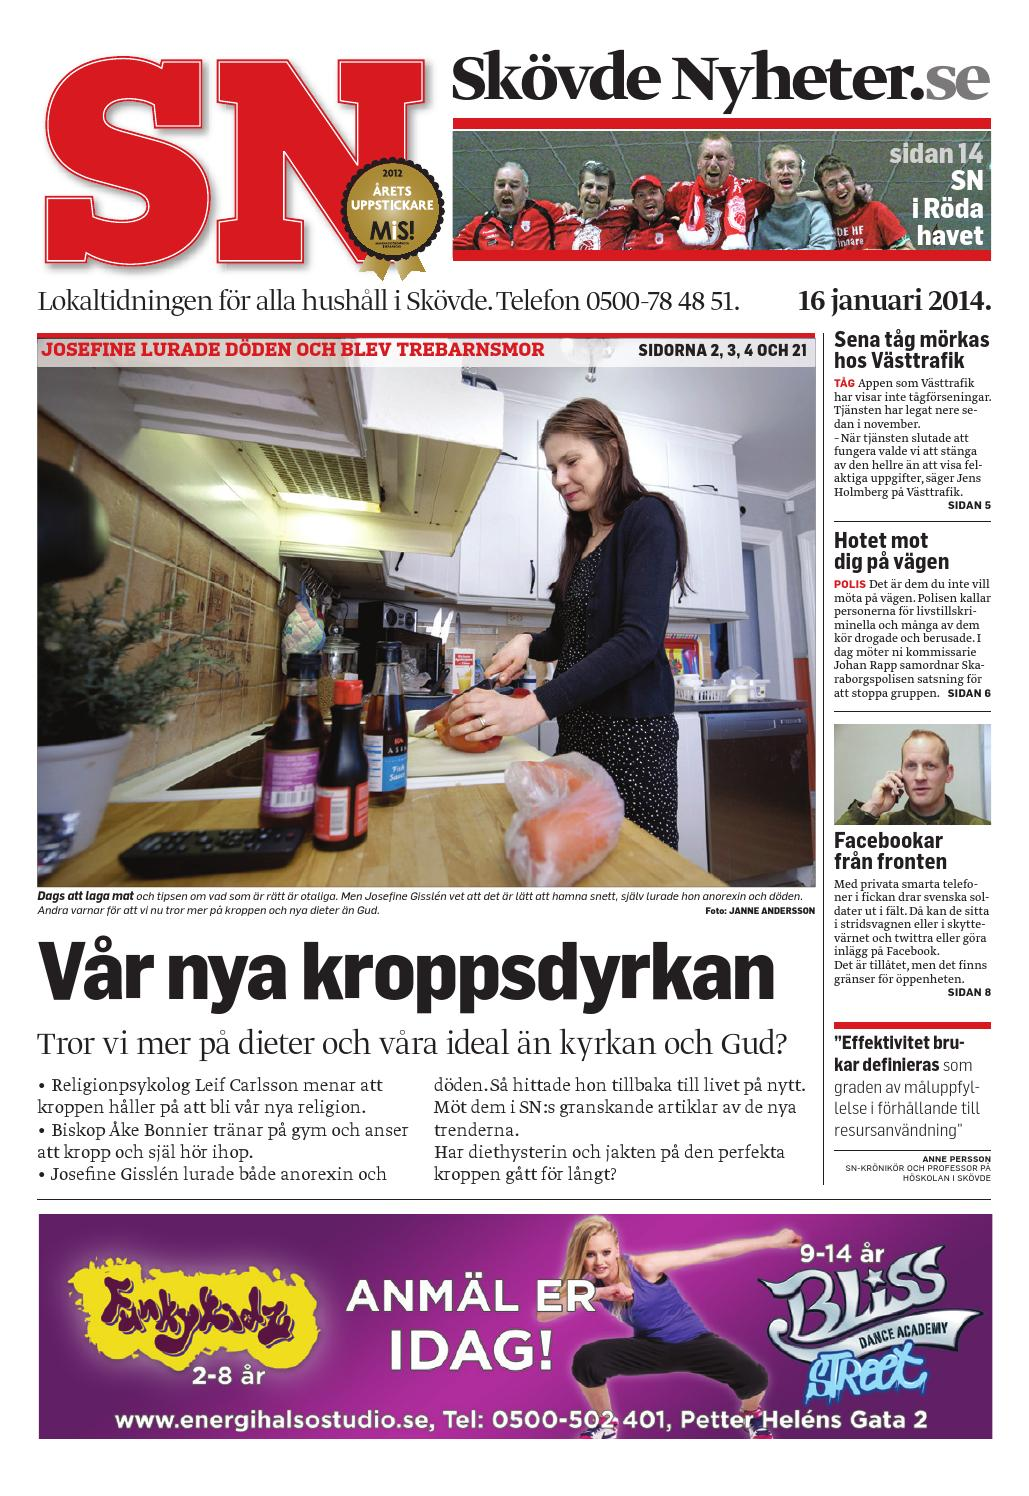 Sn 14 01 16 by Skövde Nyheter - issuu e4a8d57ea8ea0